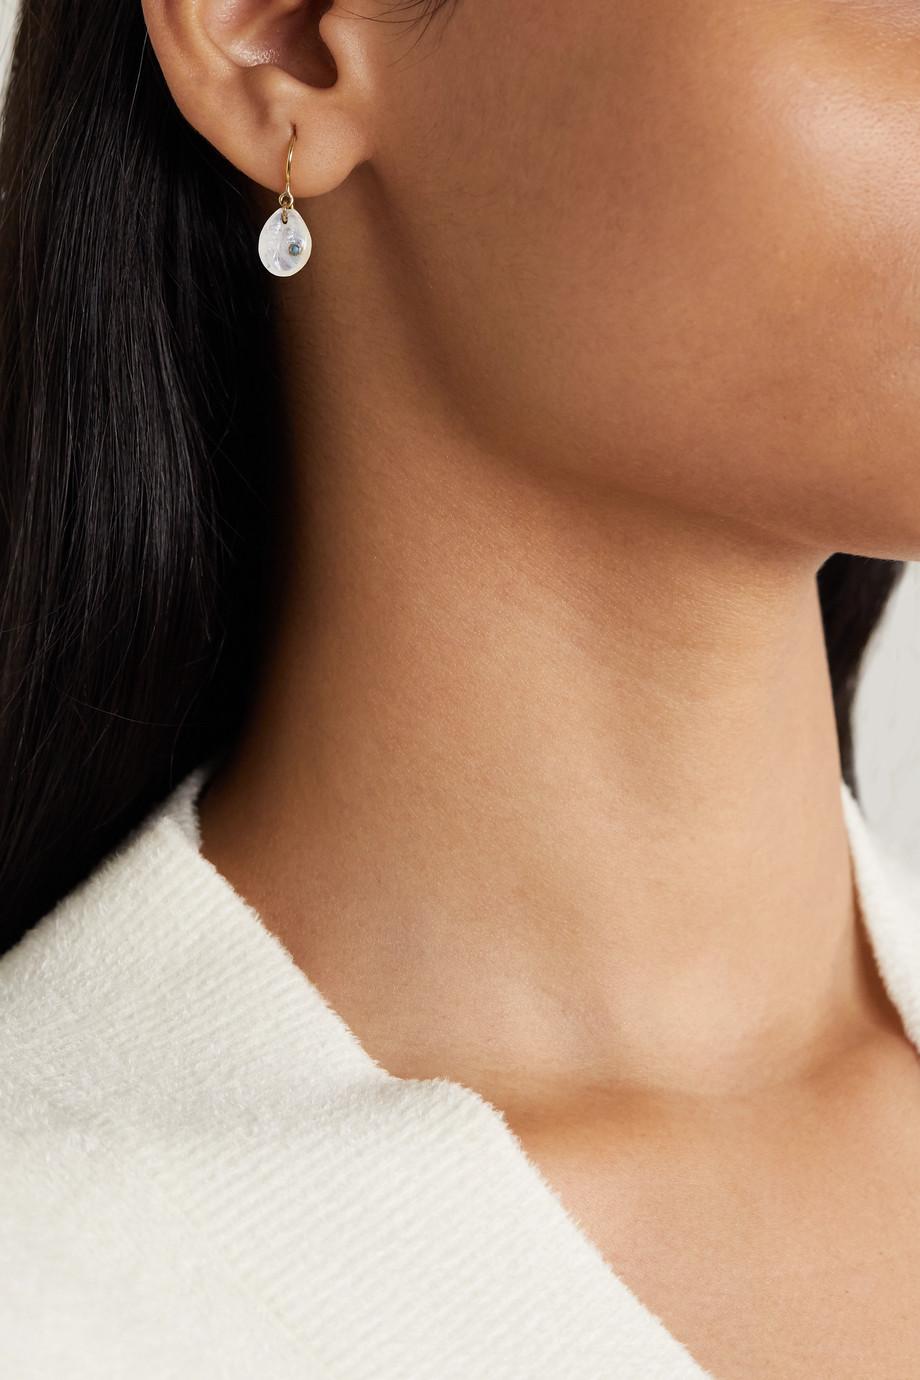 Pascale Monvoisin Cauri N°2 9-karat gold, moonstone and turquoise earring